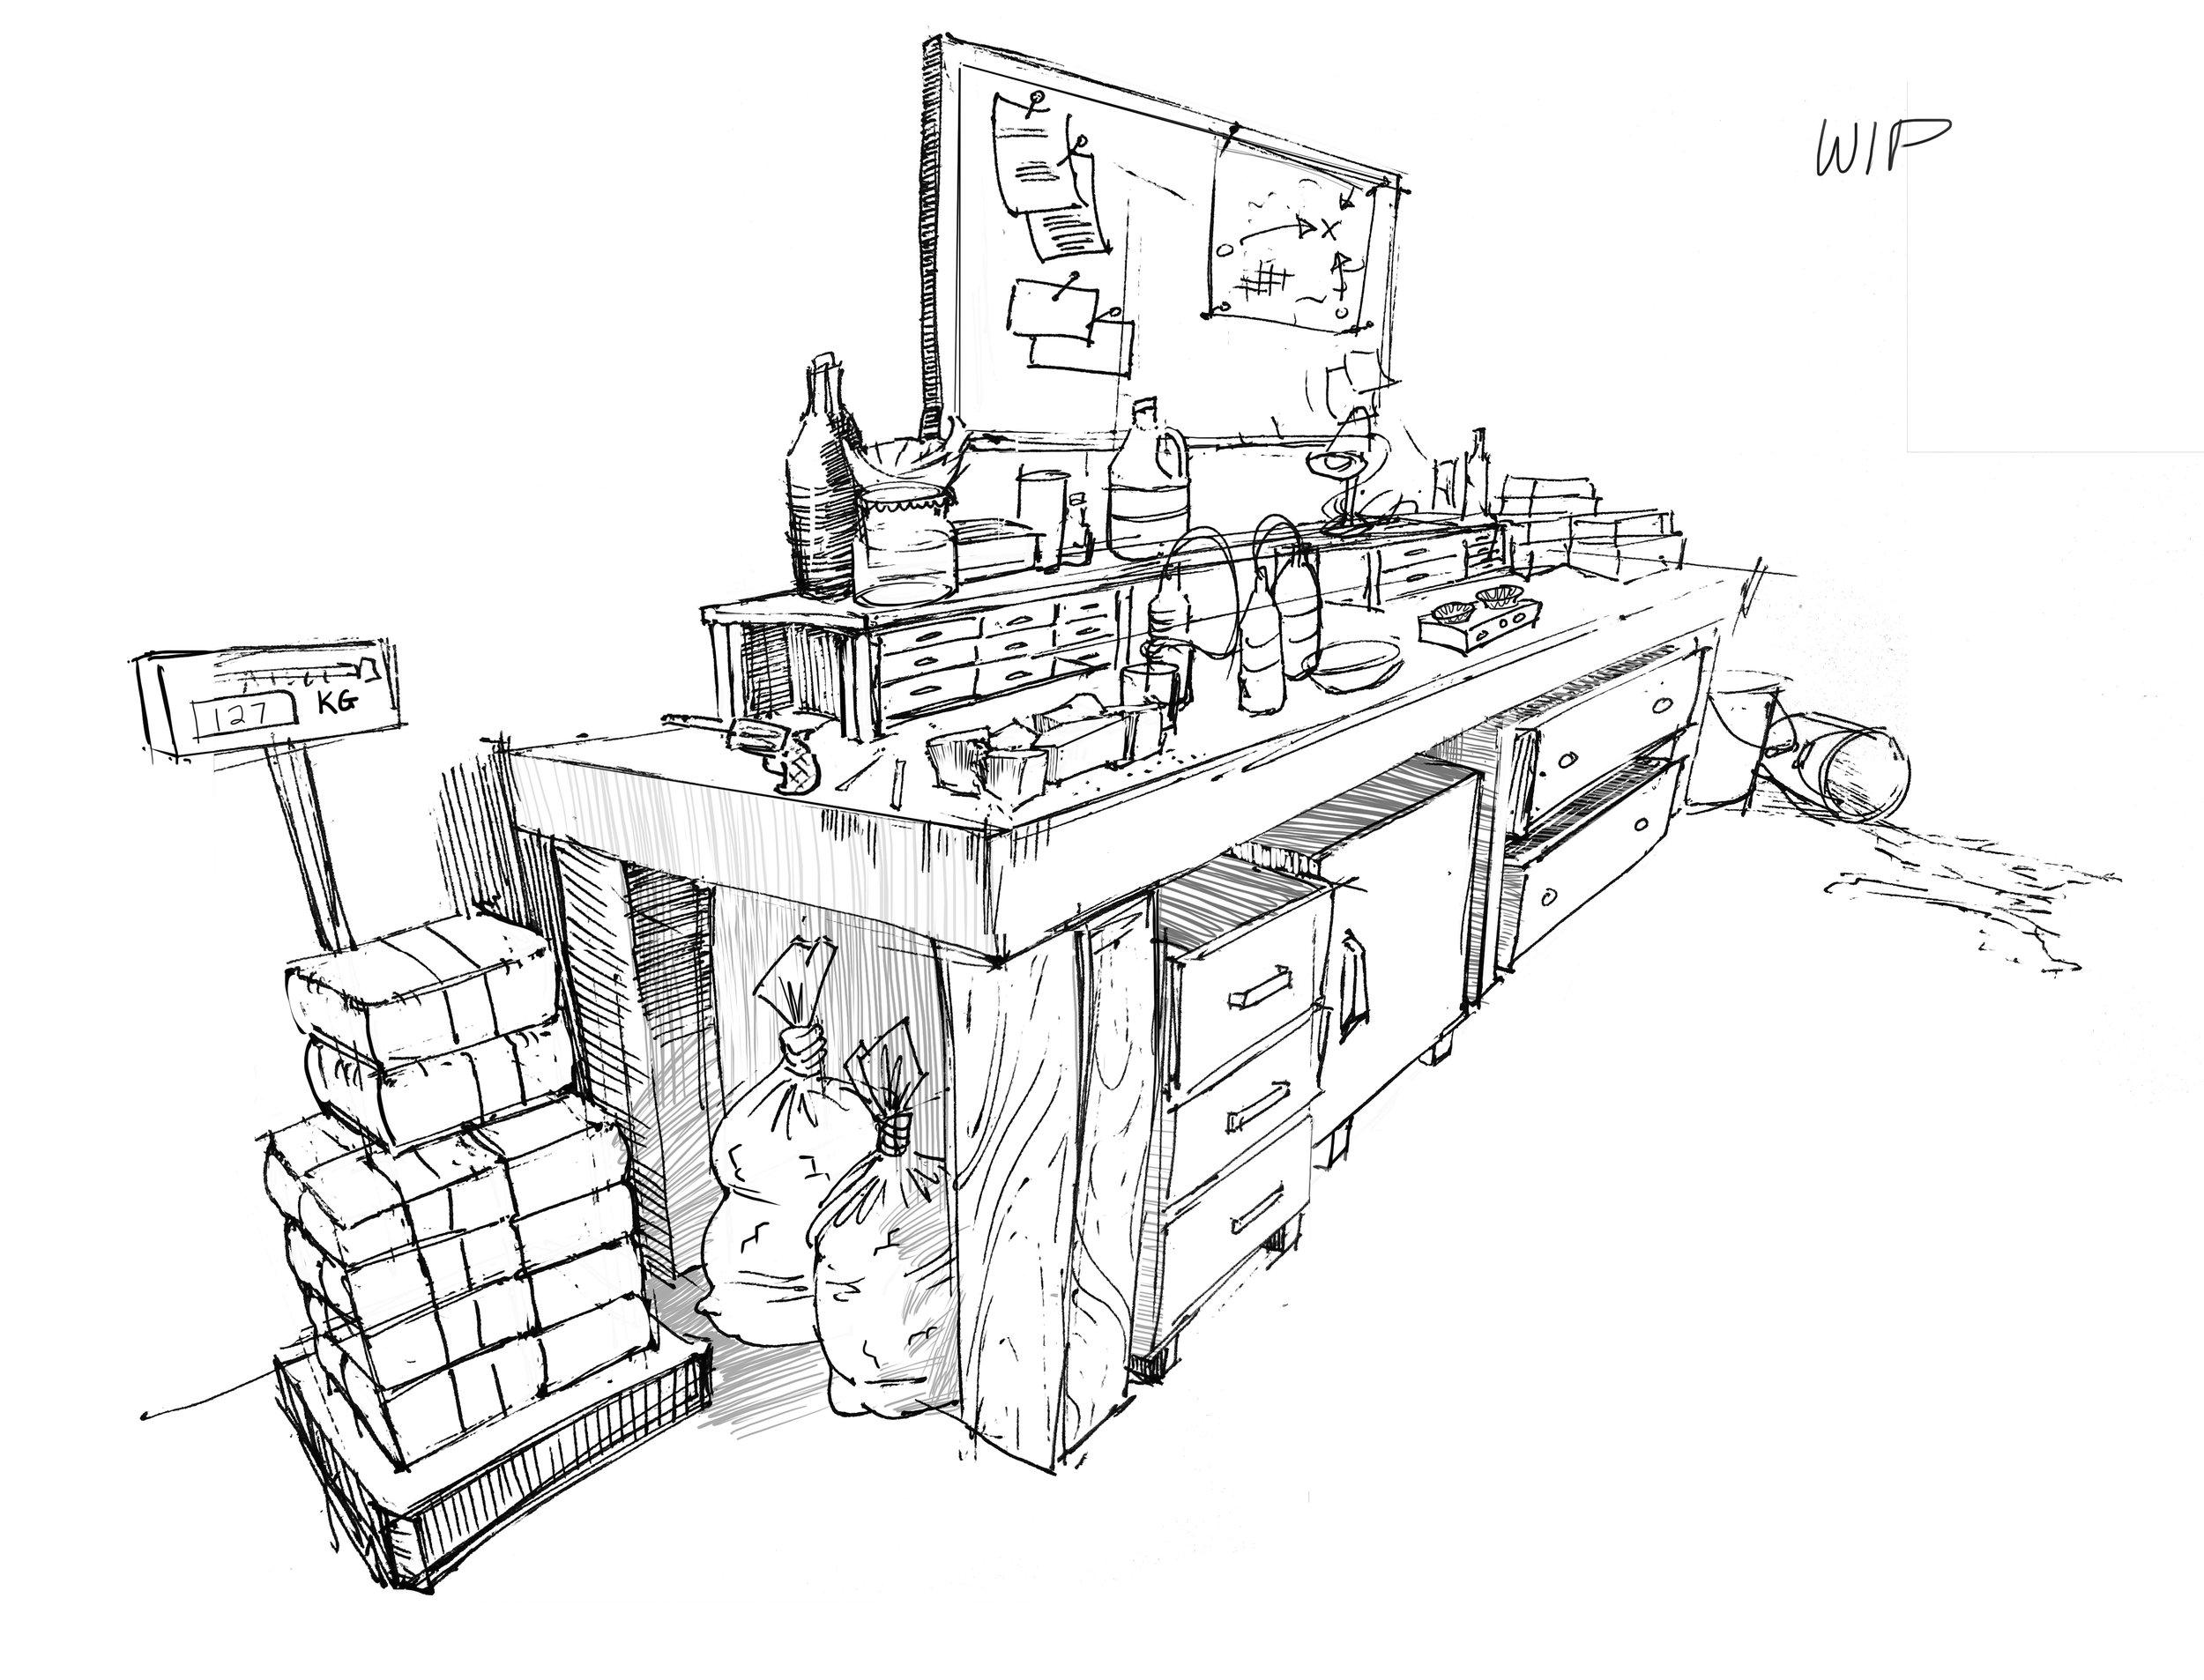 basement_workbench_sketch.jpg